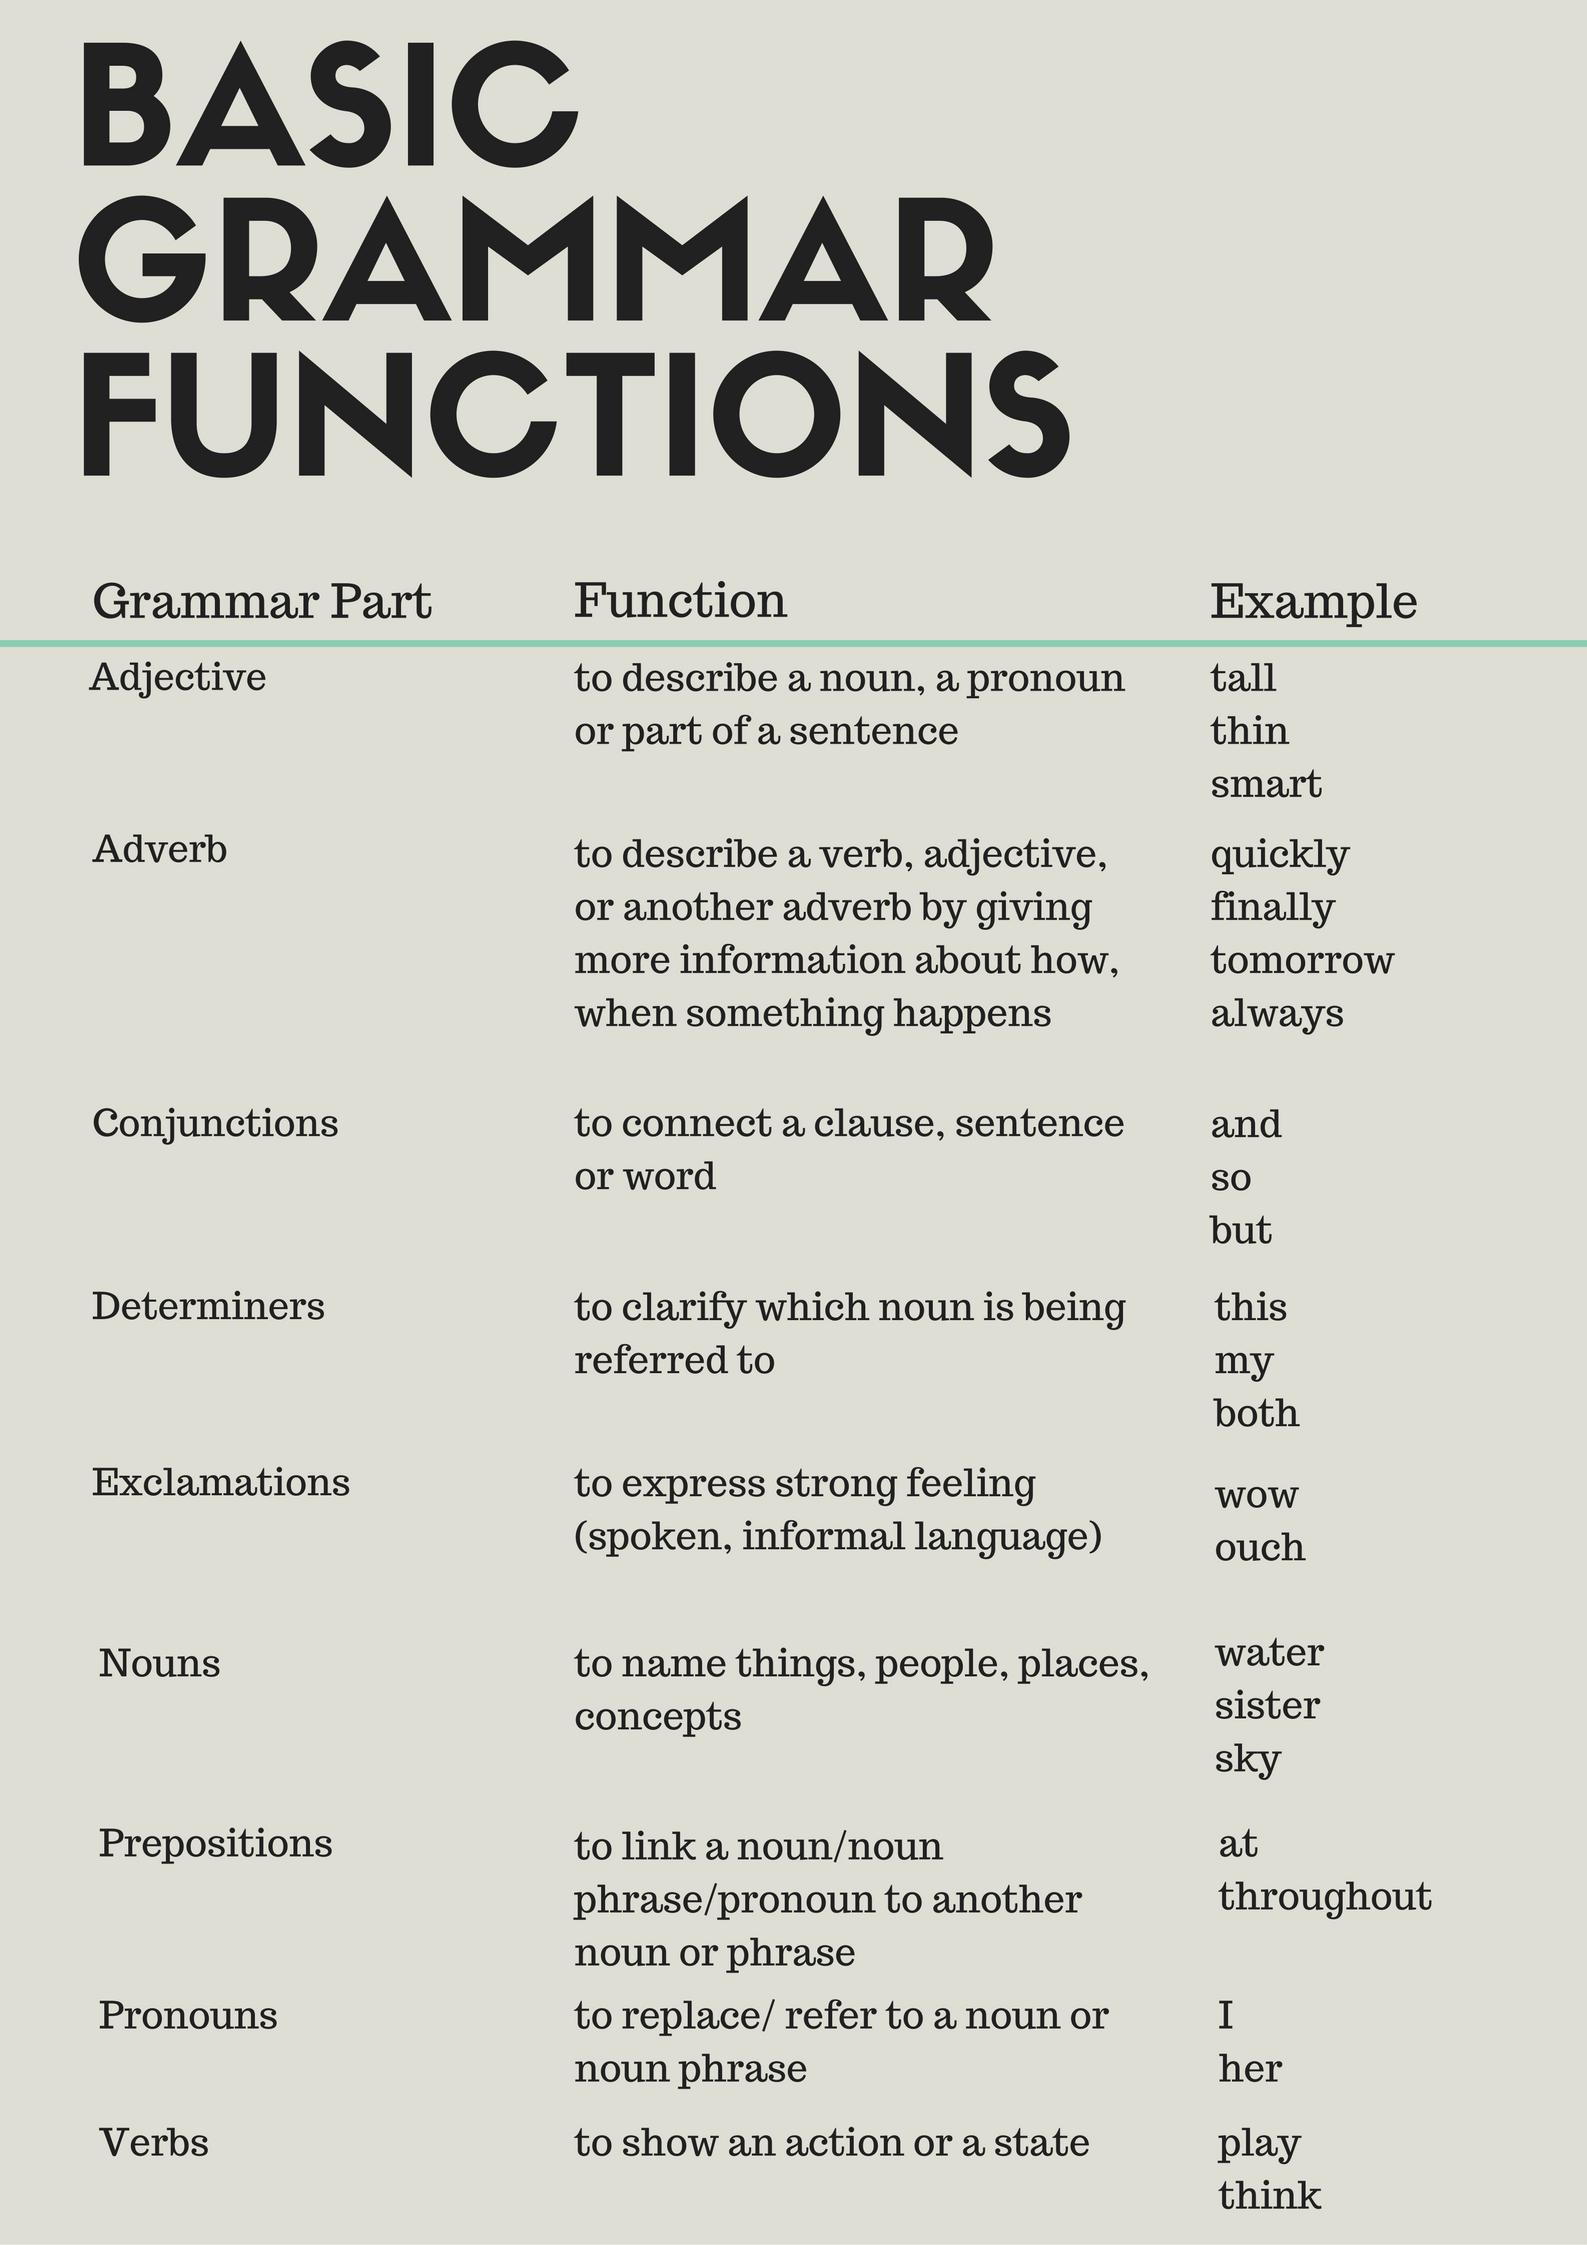 Basic Grammar Functions